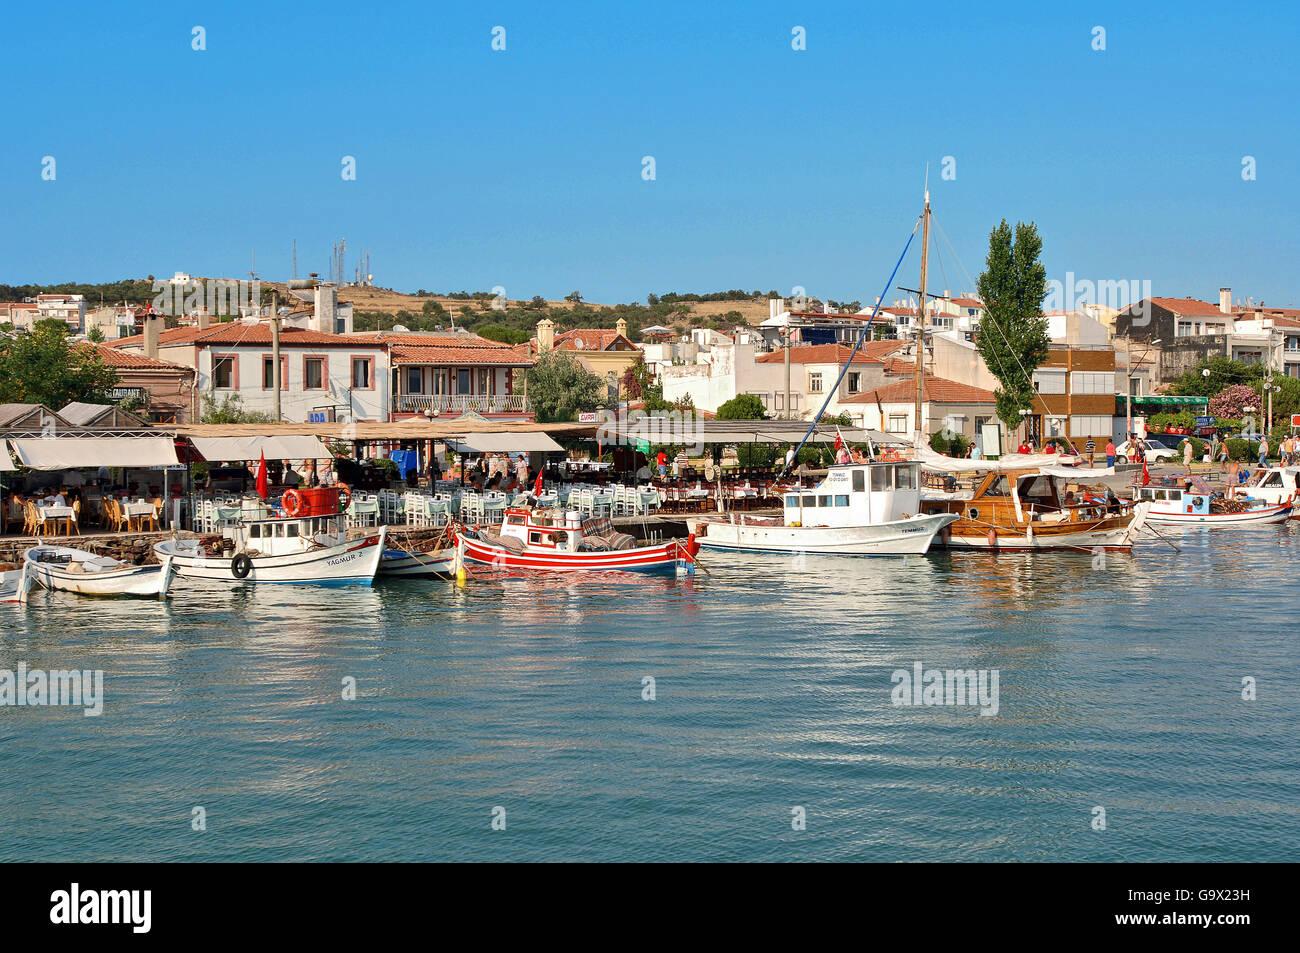 Cunda, Ayvalik, Balikesir, Turkey, Asia / Ayvalik - Stock Image